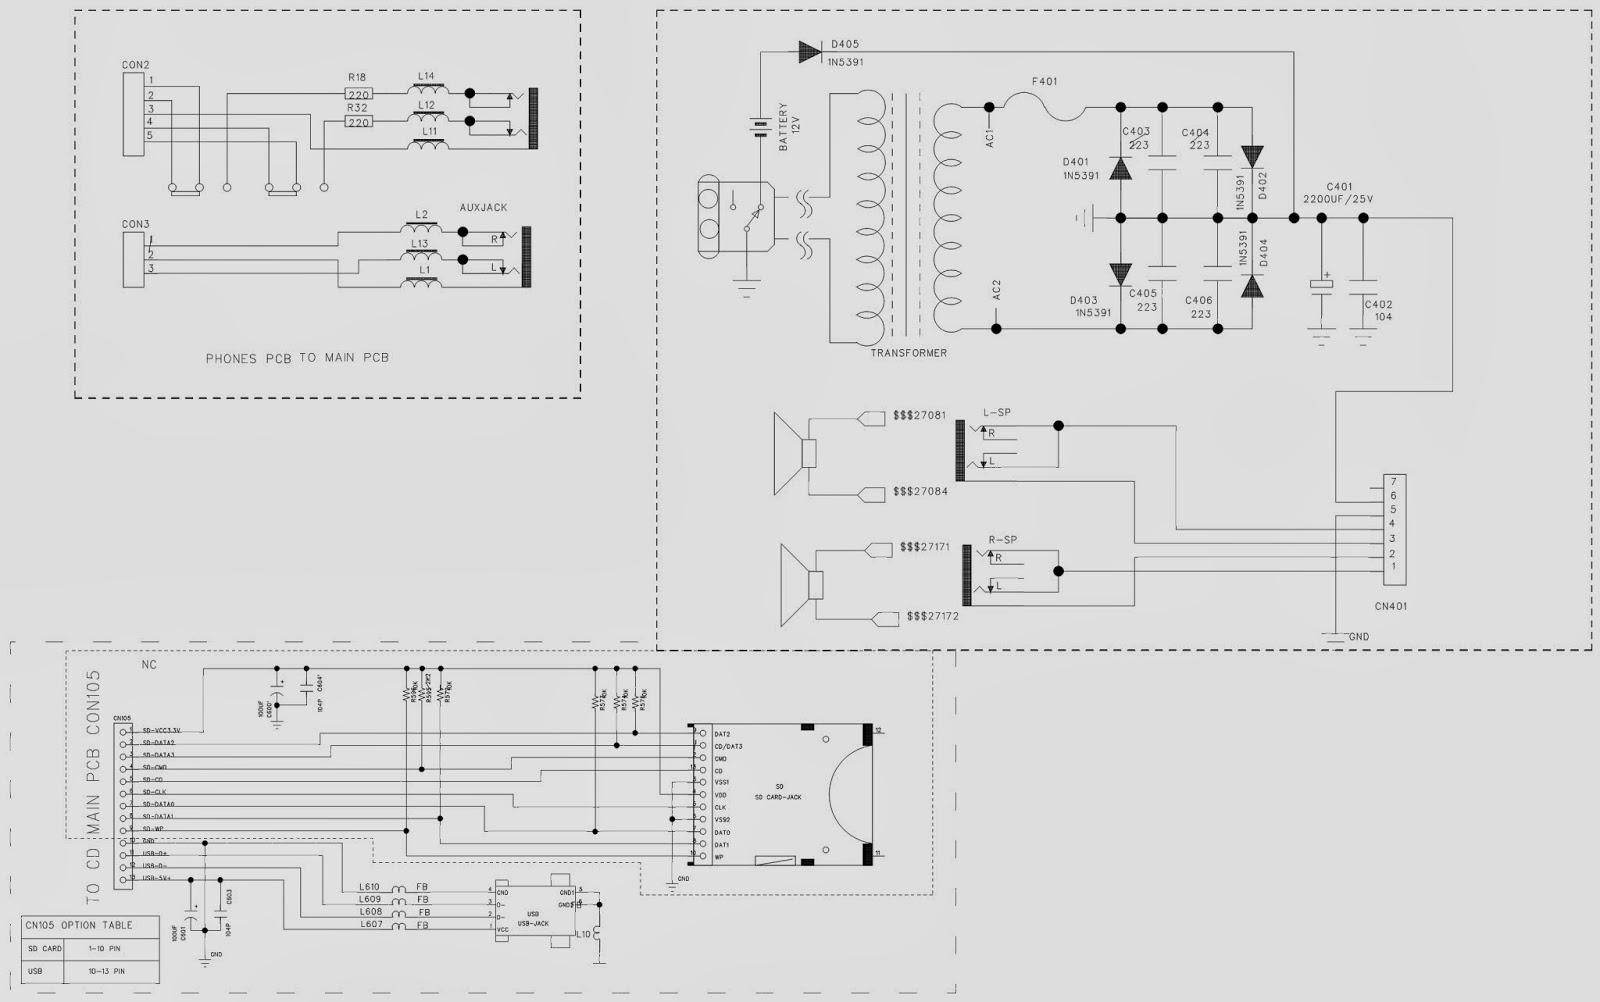 philco    philips   msp211n - microsystem - schematic  circuit diagram